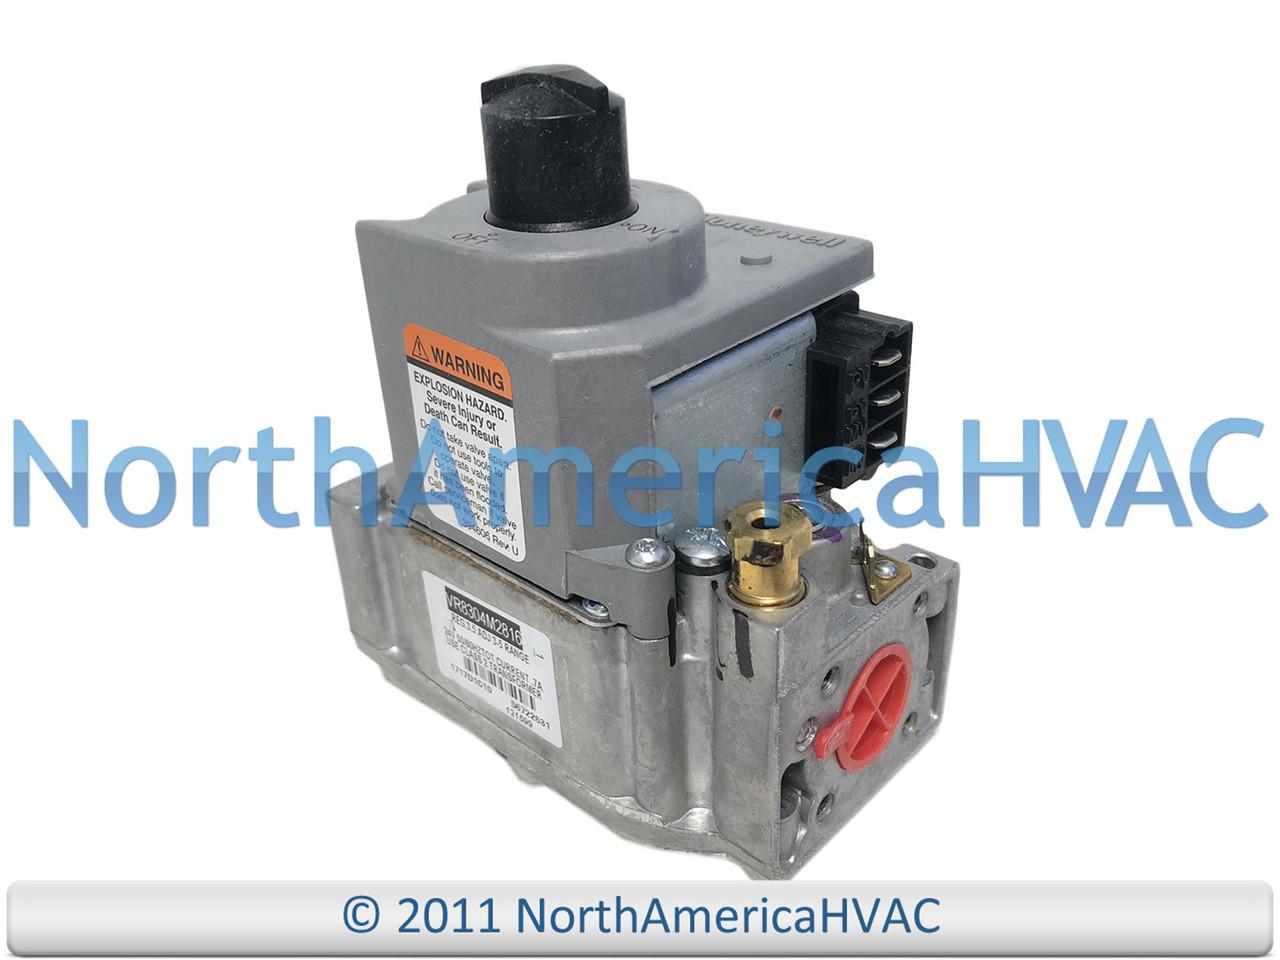 Oem Honeywell Natural Gas Valve Vr8304m2816 Vr8304m 2816